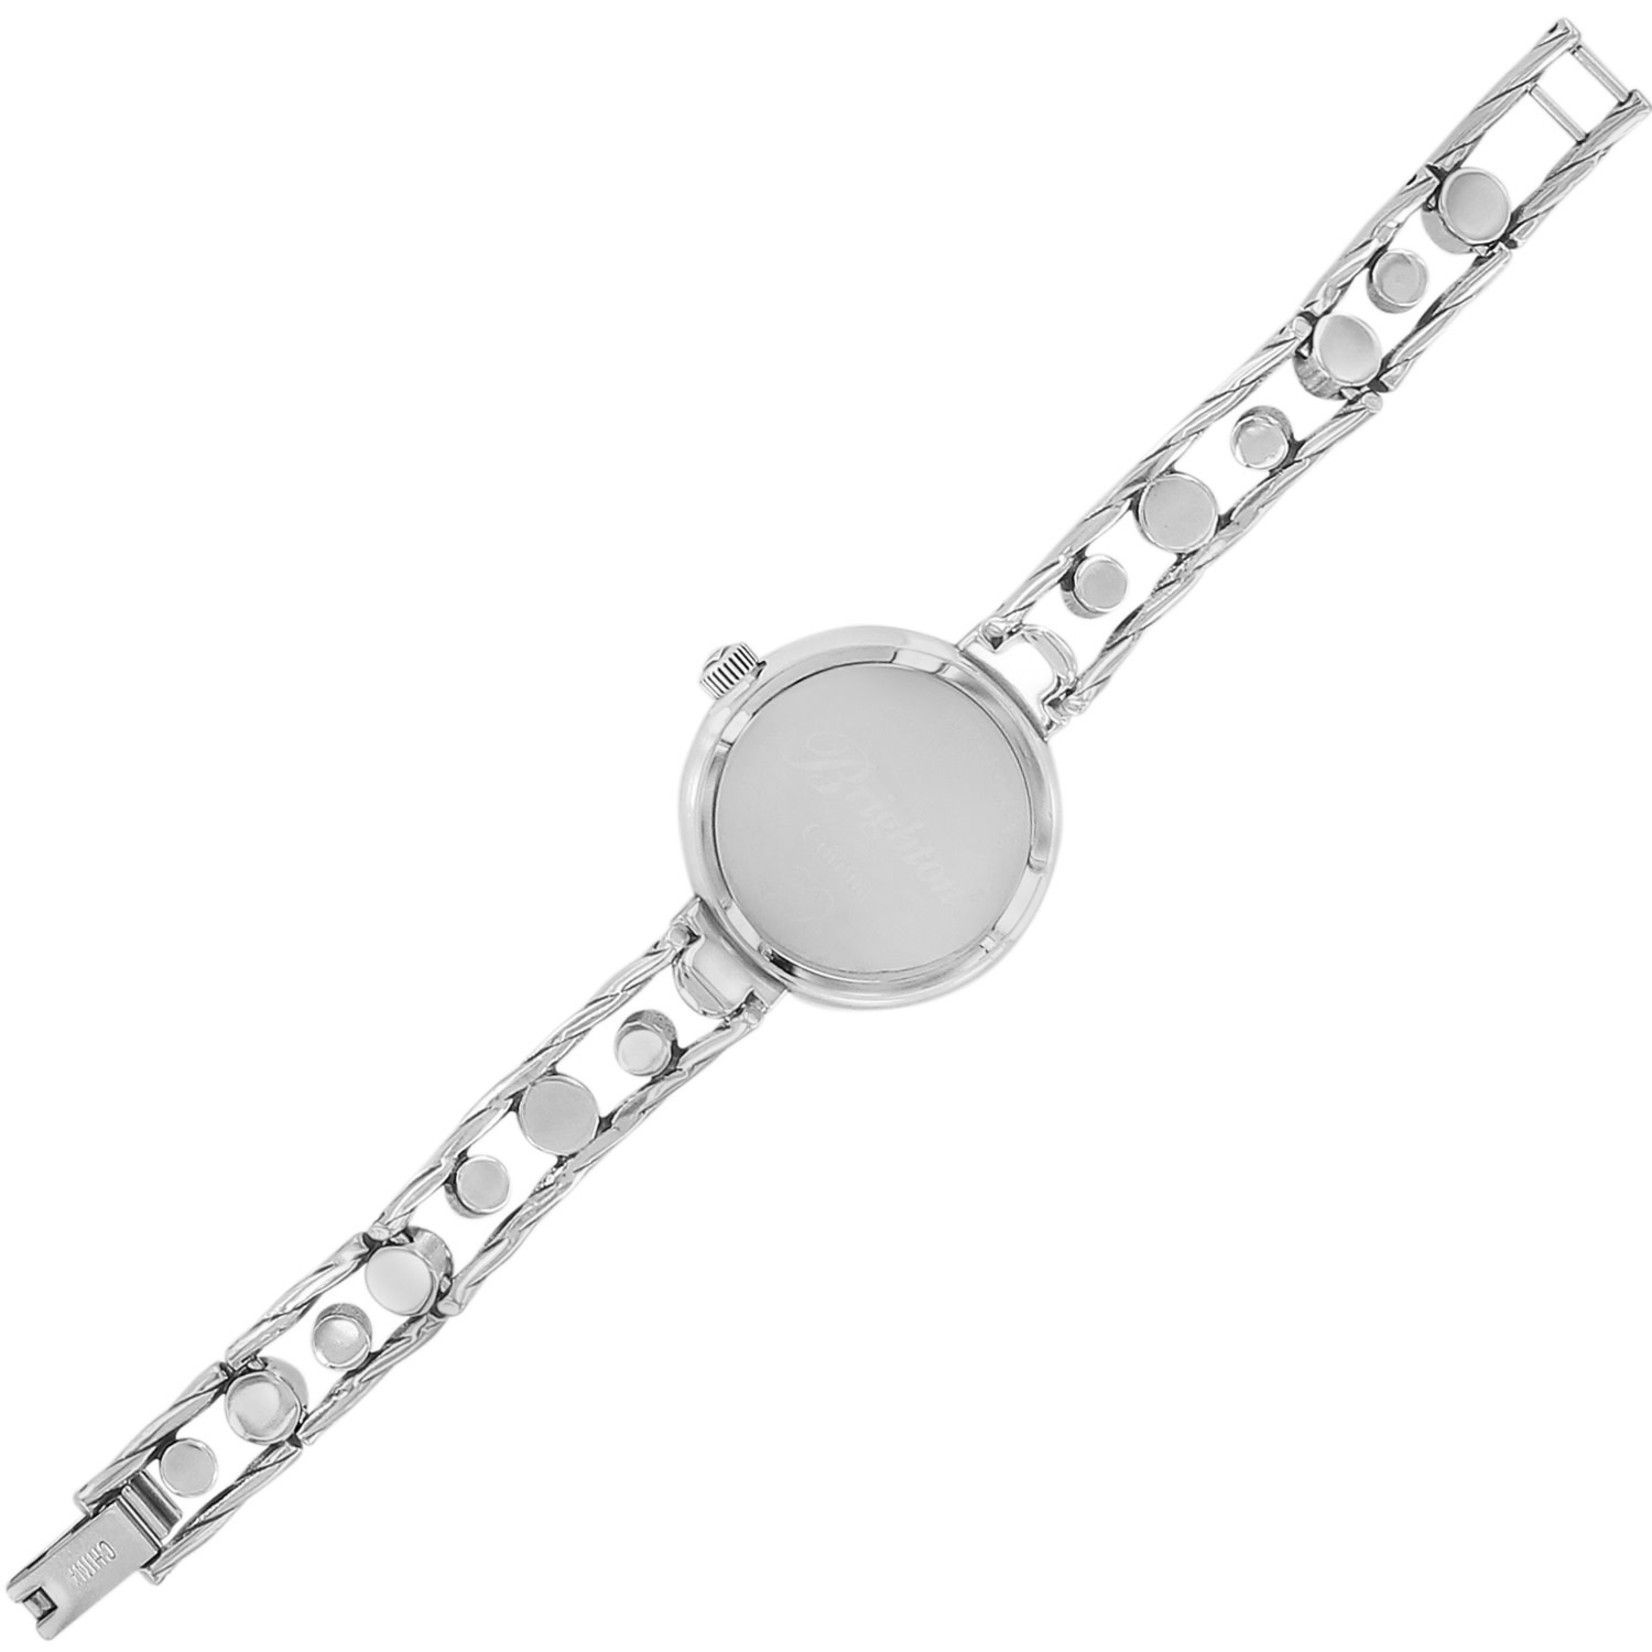 Brighton Halo Corona Watch